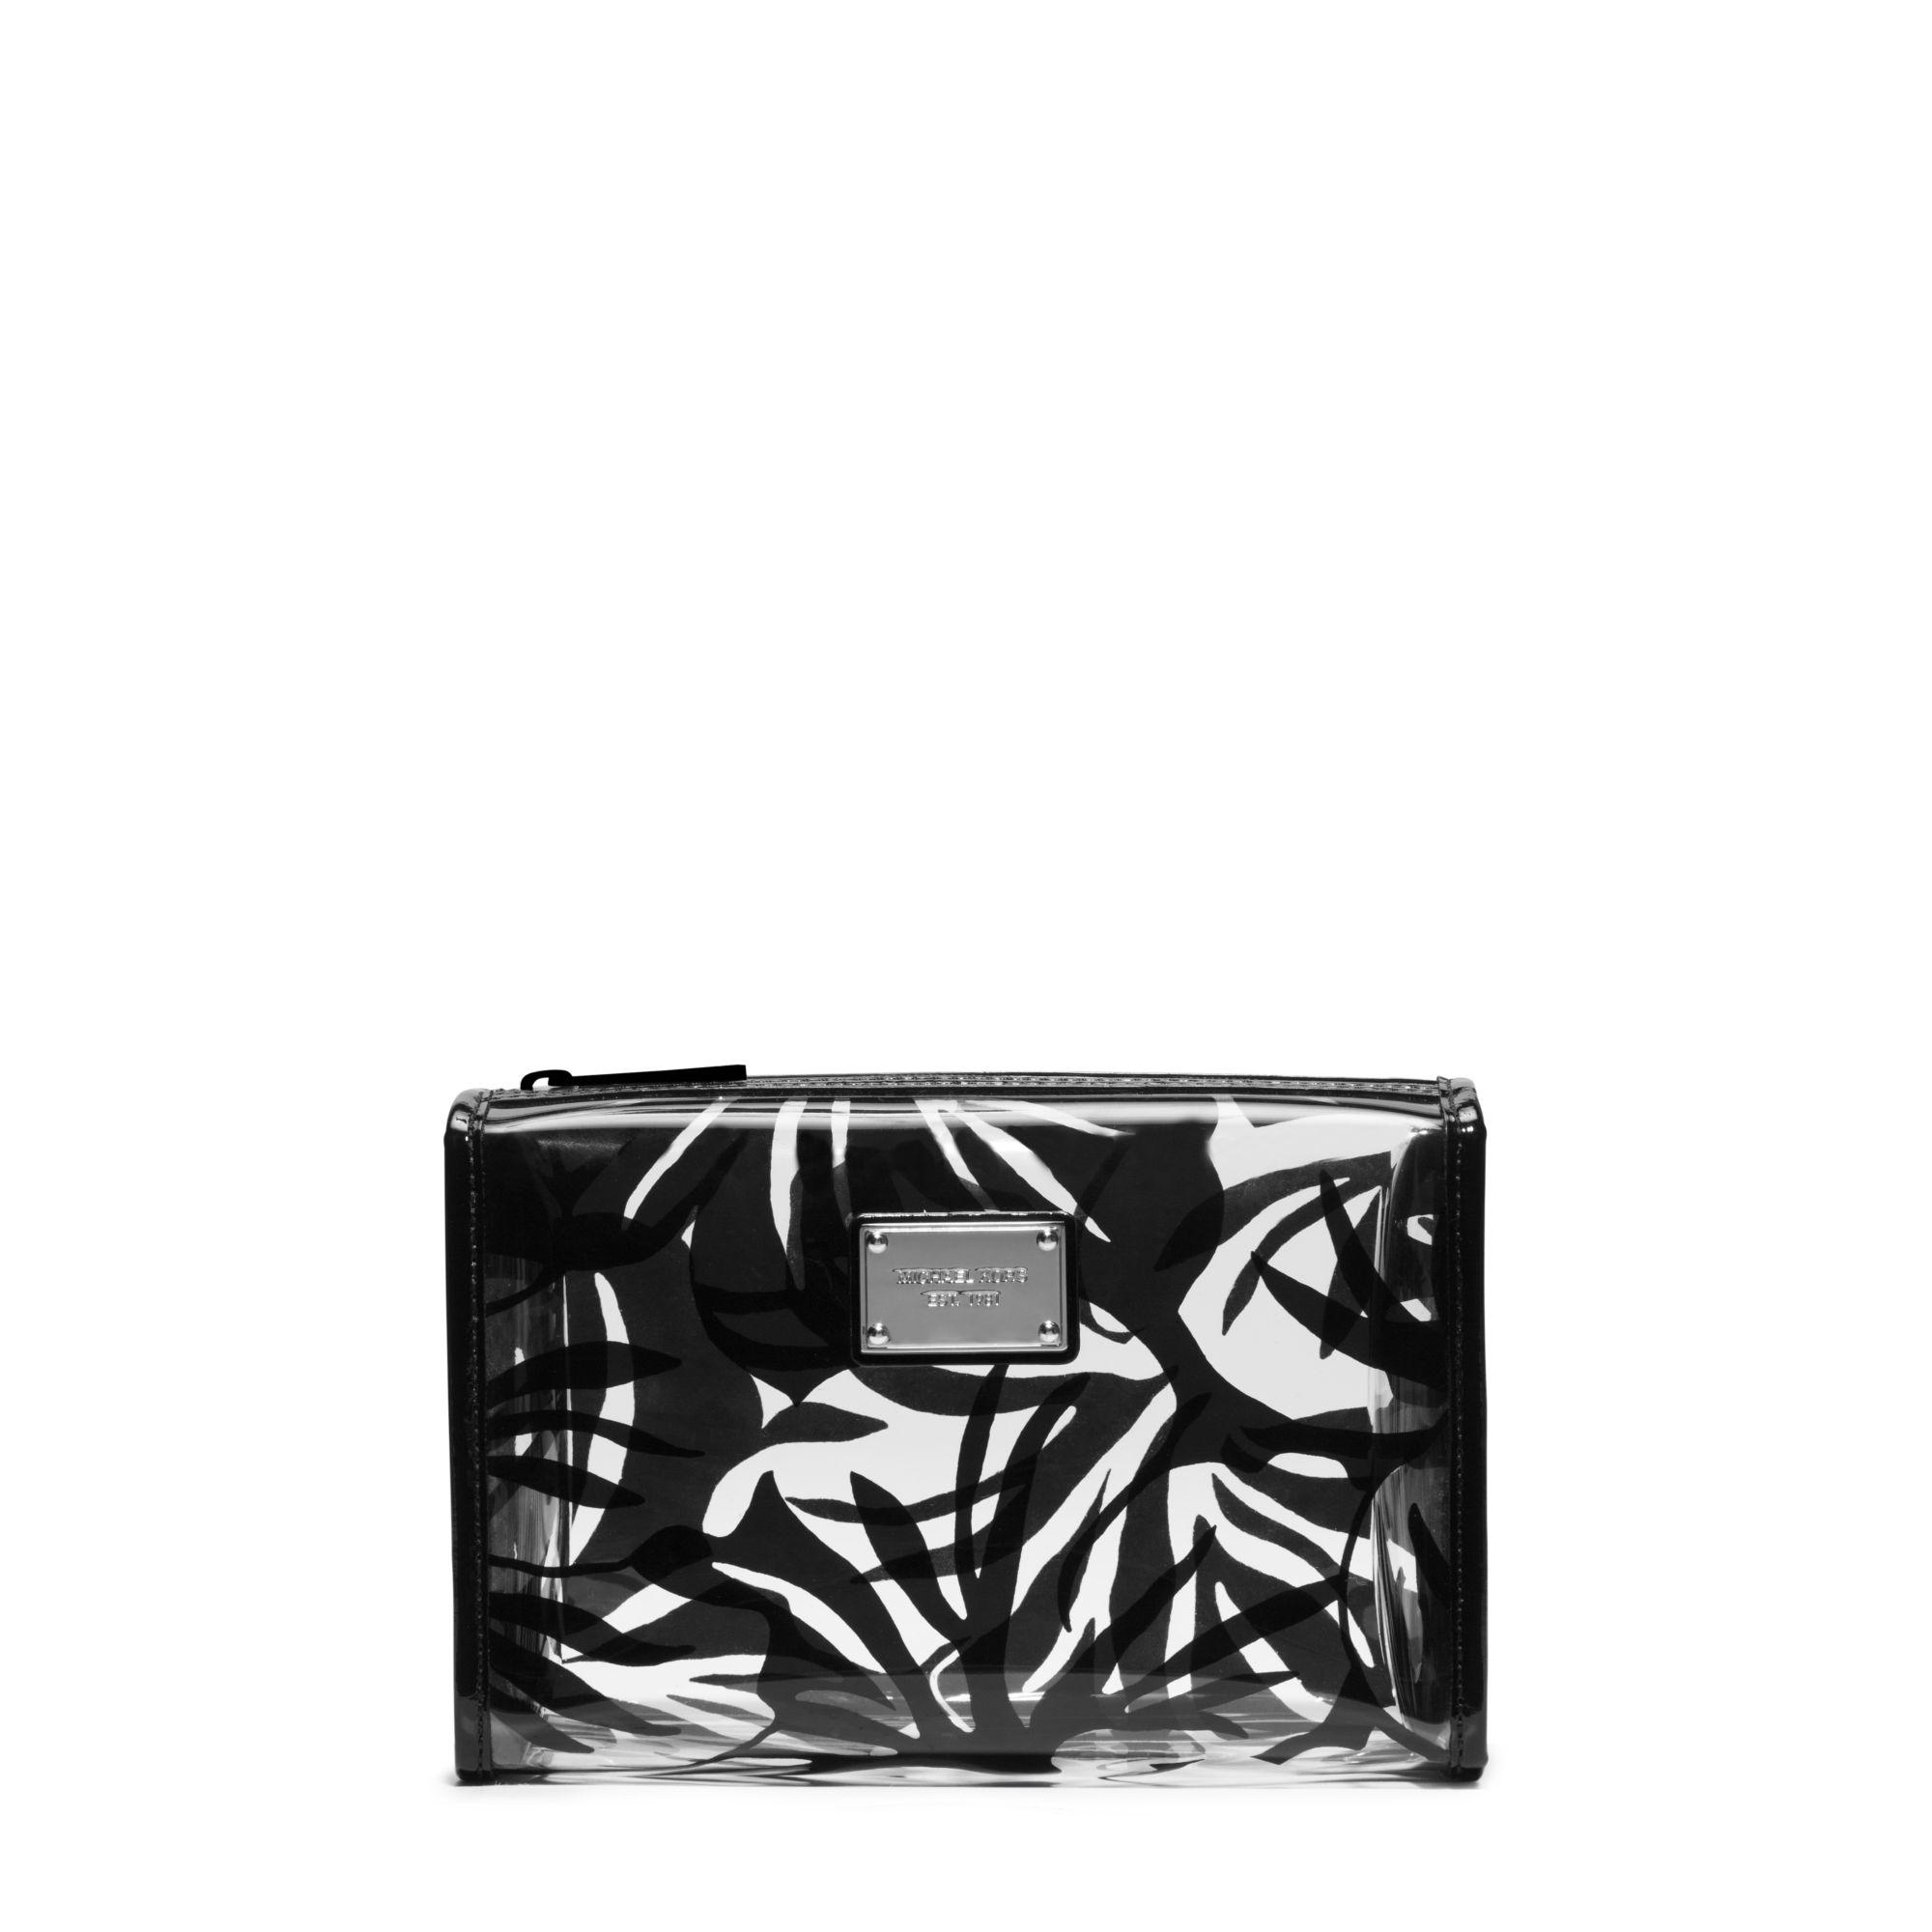 ca5927296f57 Lyst - Michael Kors Eliza Large Tropical-Print Plastic Pouch in Black